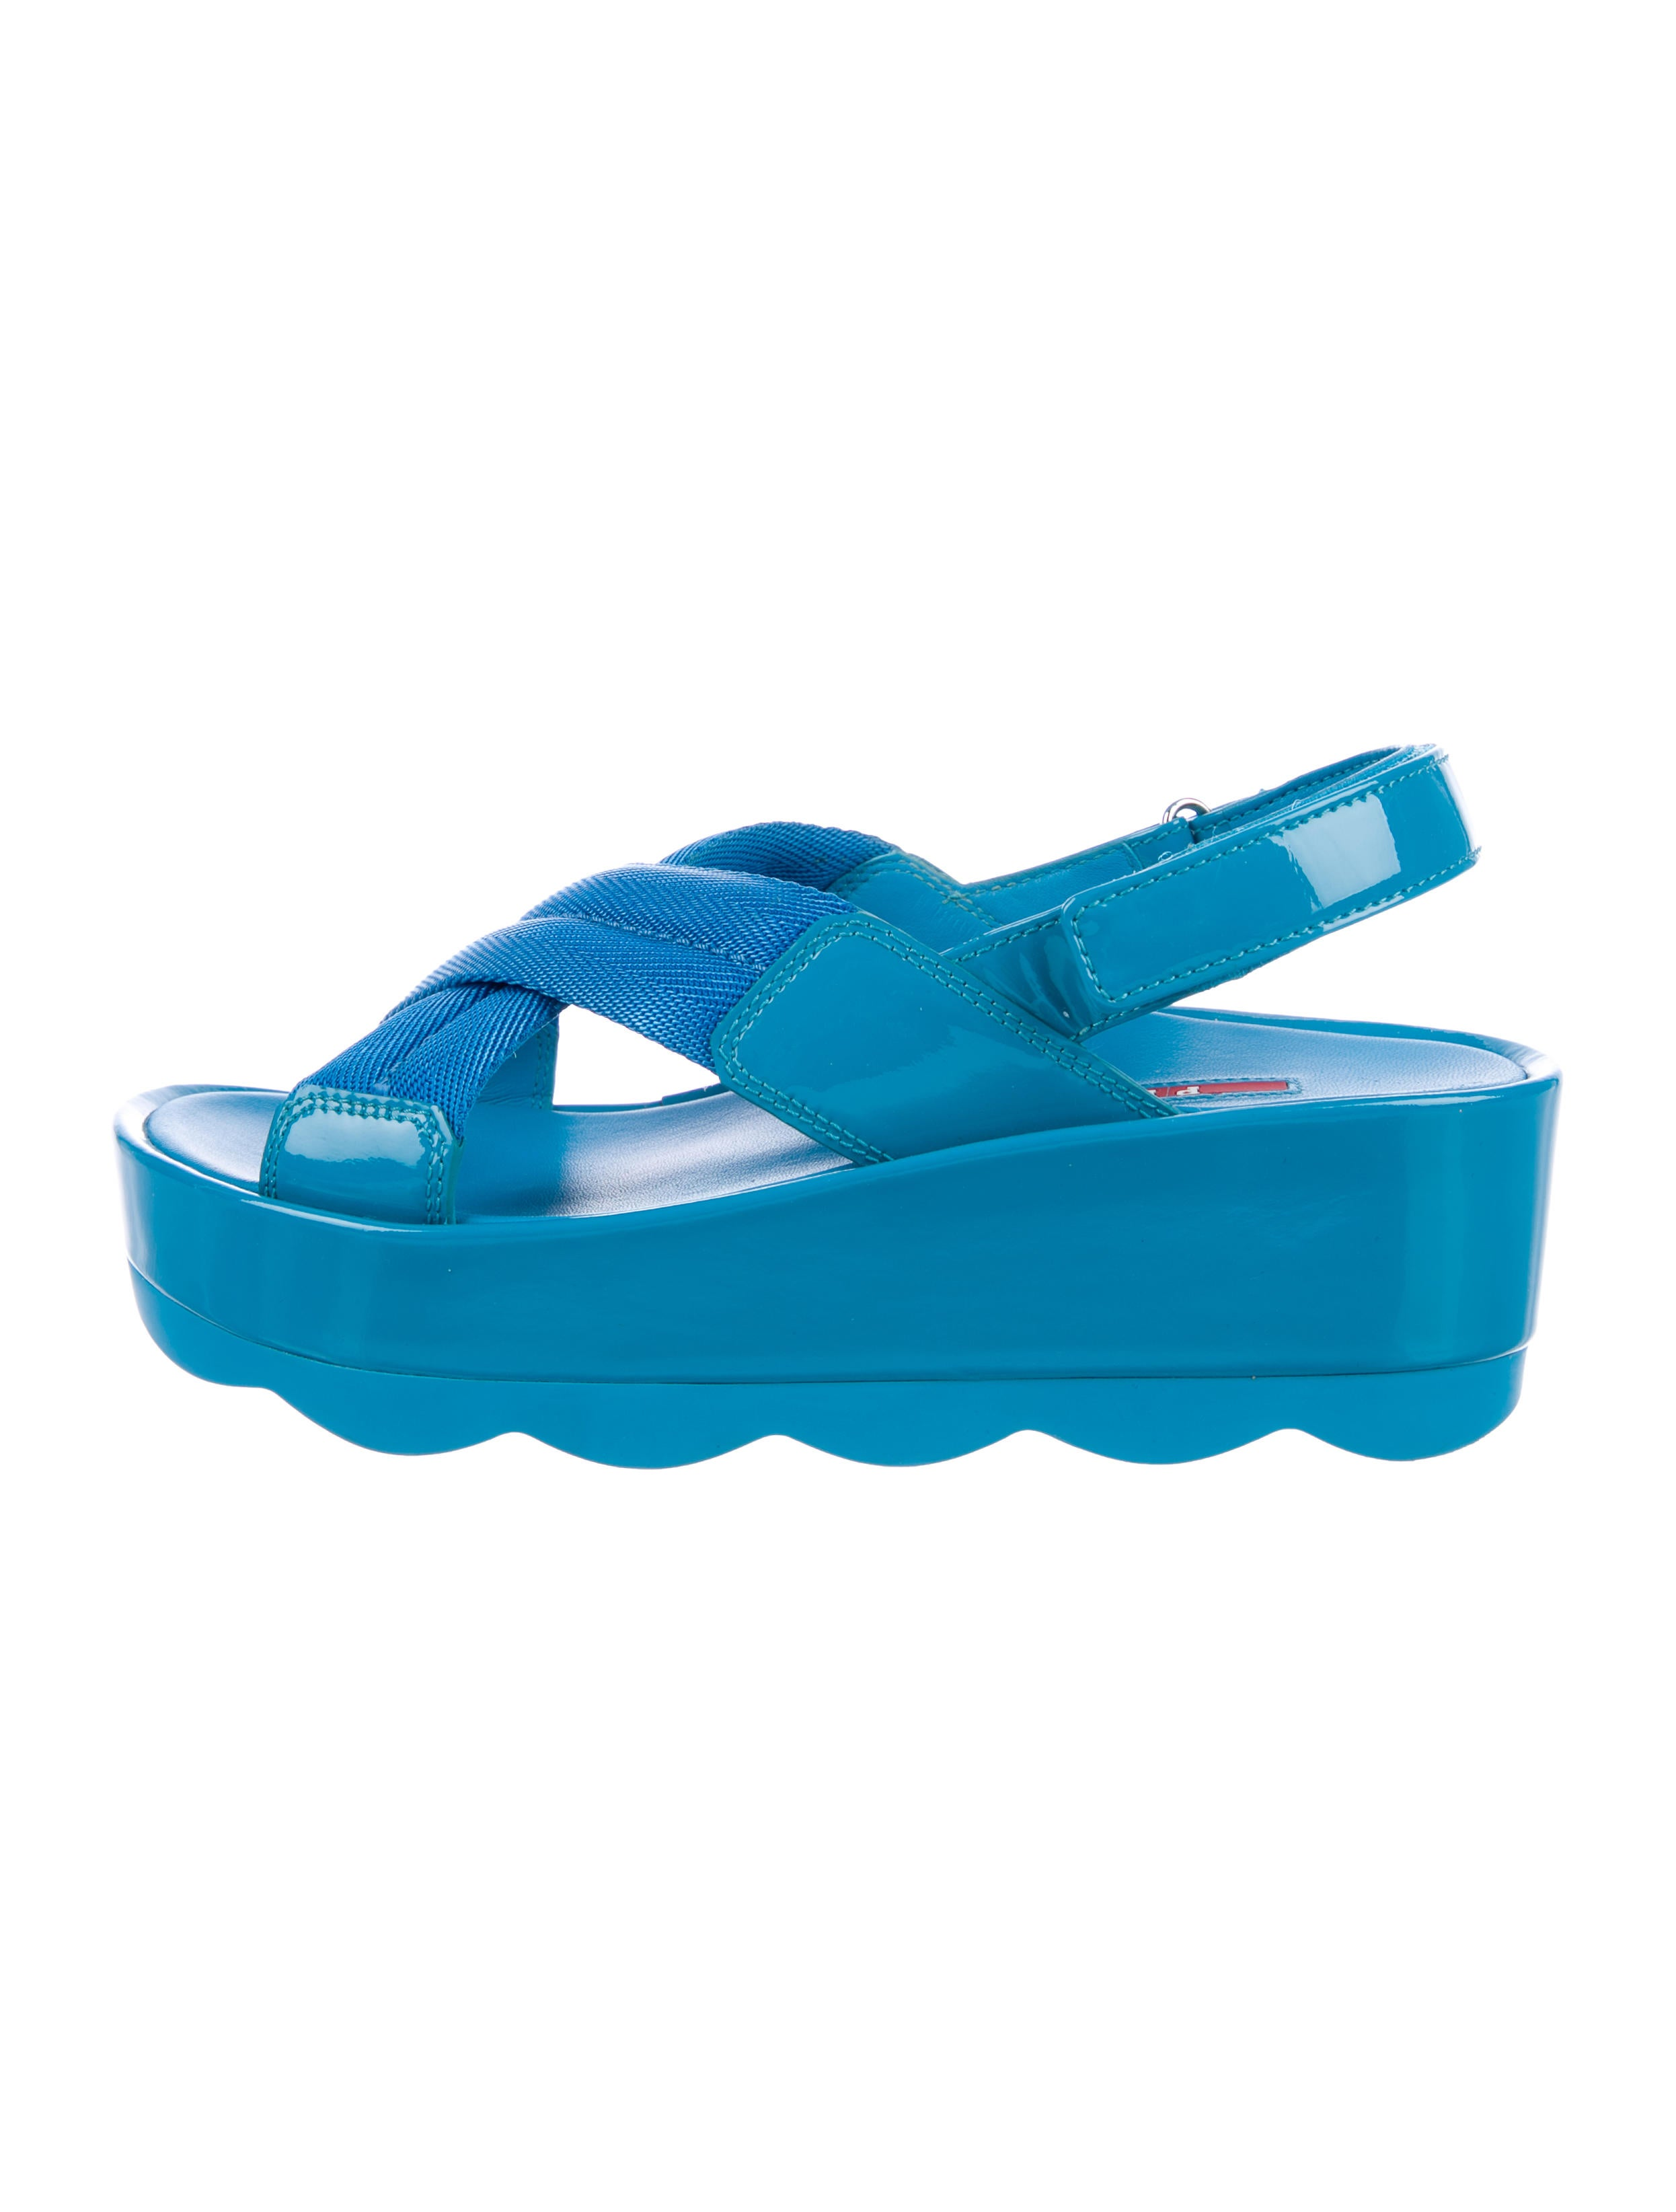 999b2e0d0c9b Prada Sport Slingback Flatform Sandals - Shoes - WPR49331